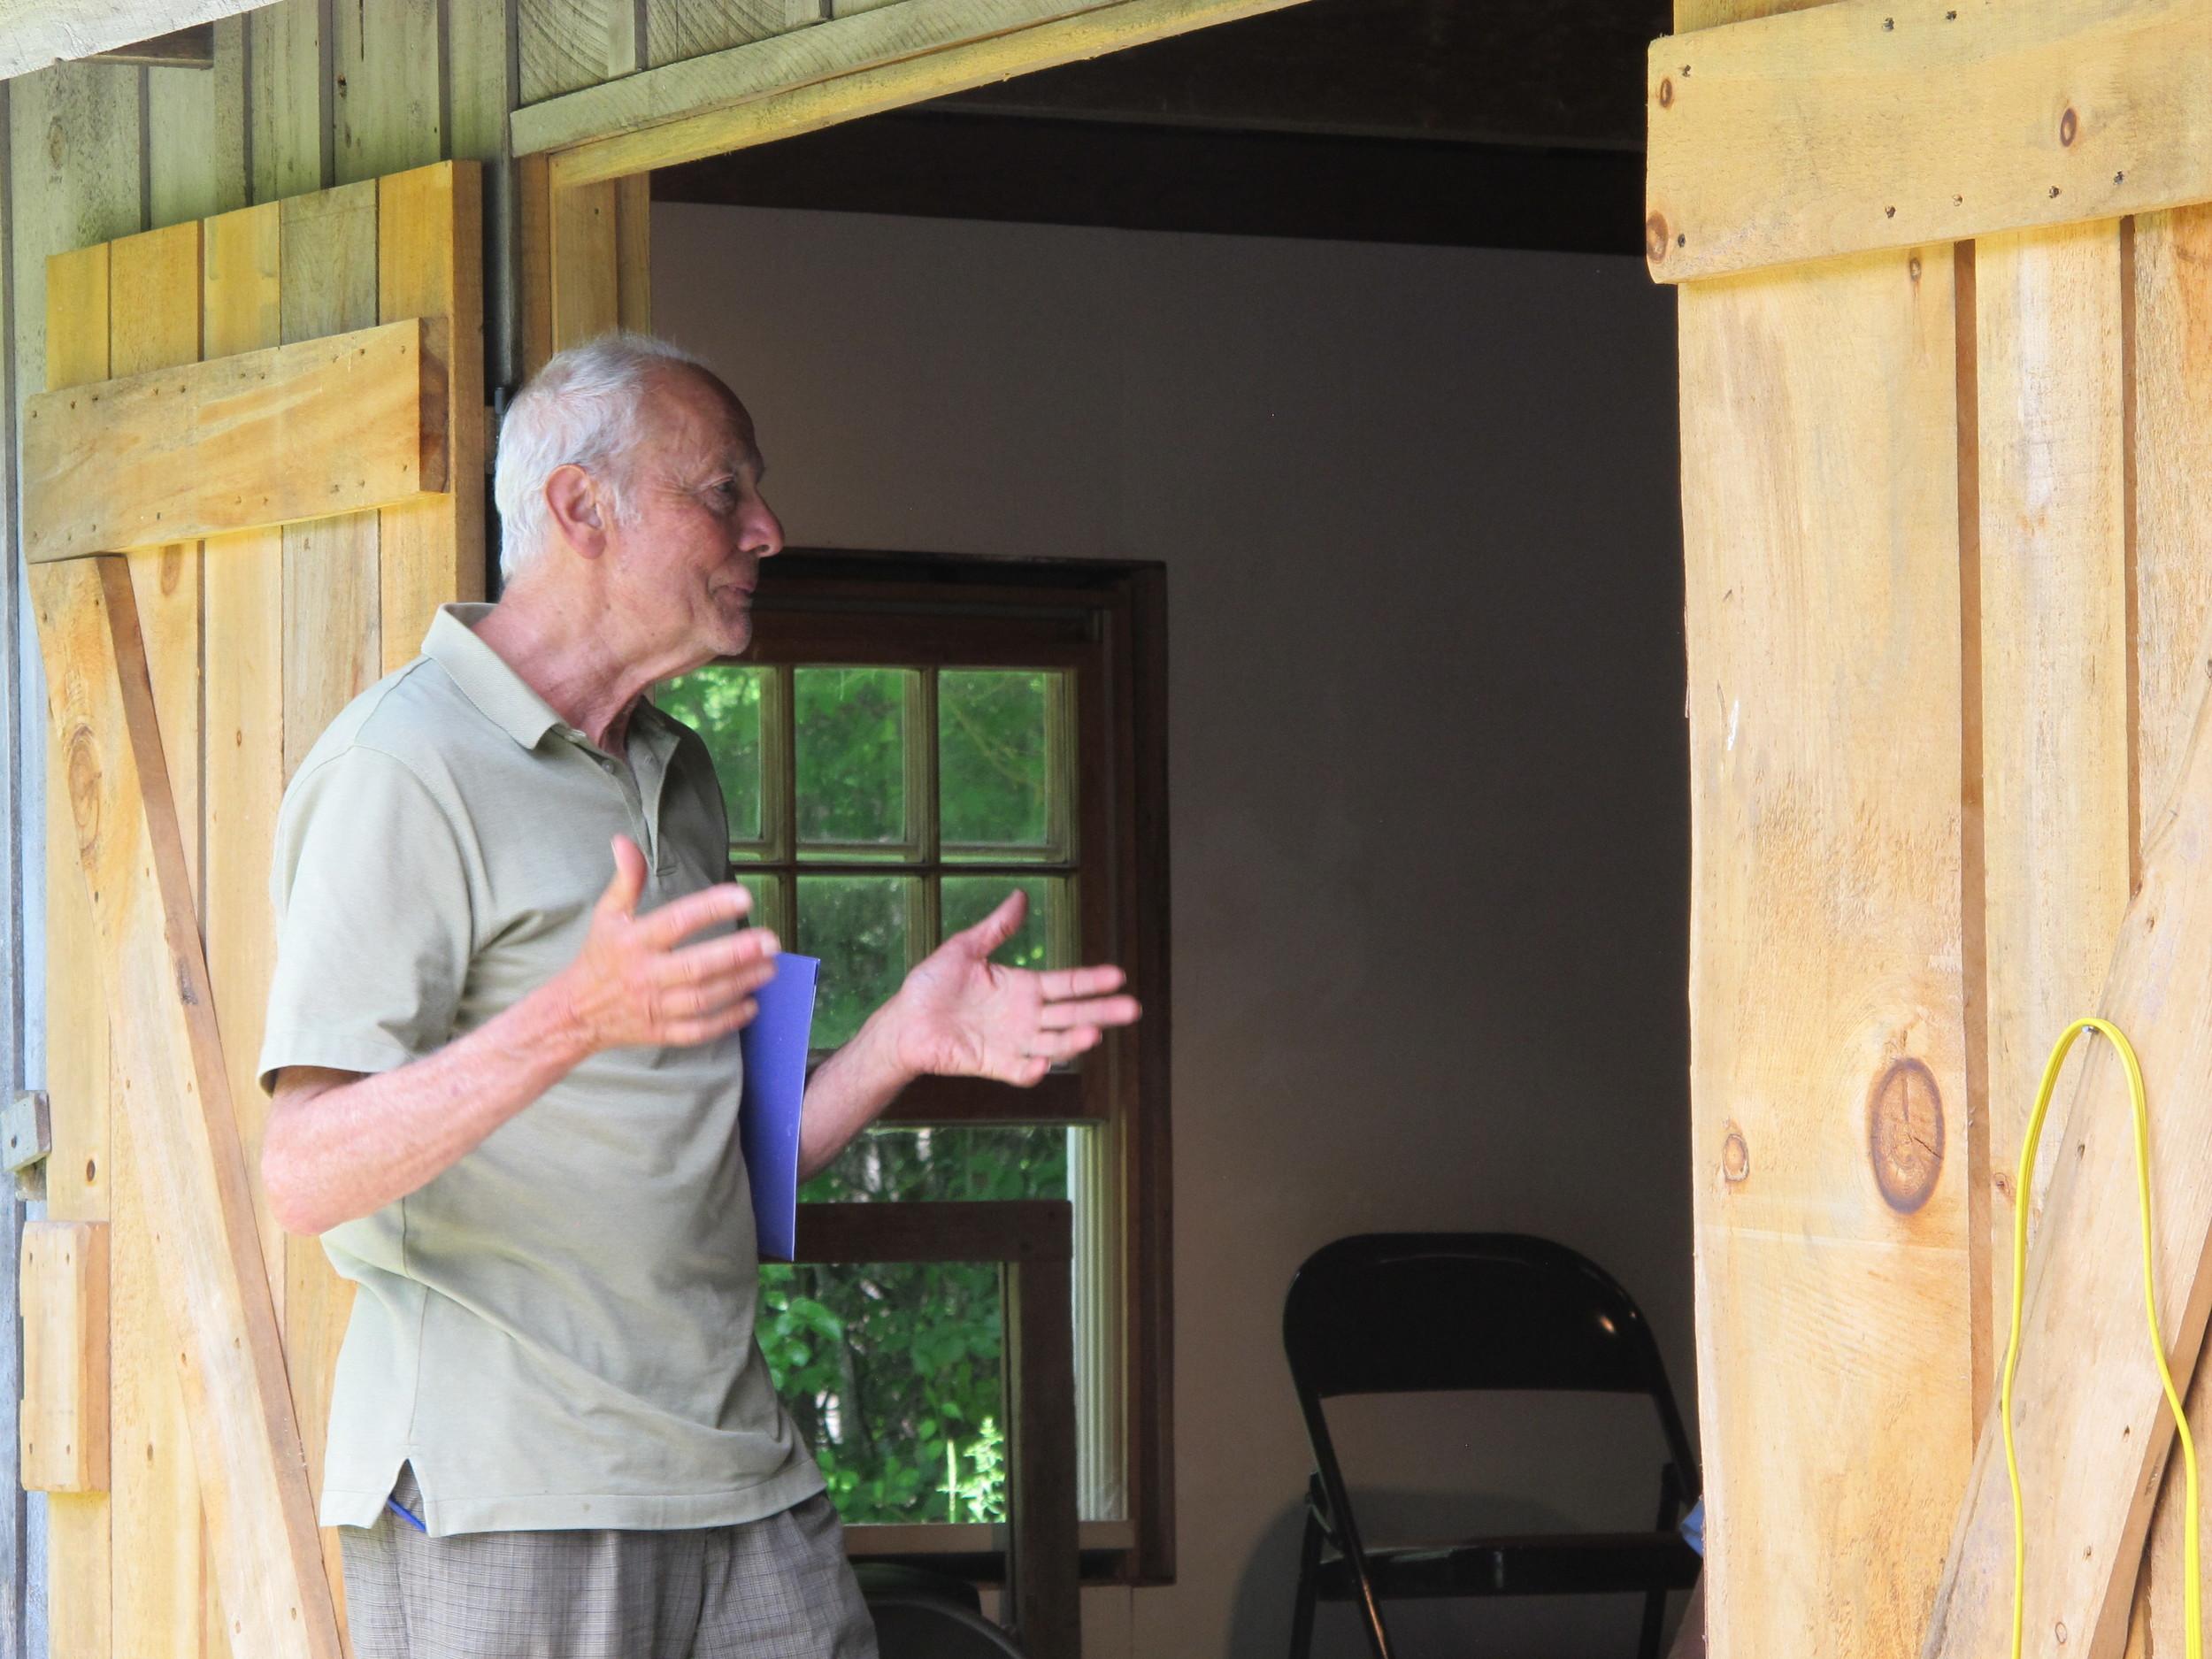 Tony Ferrara moderates the discussion.